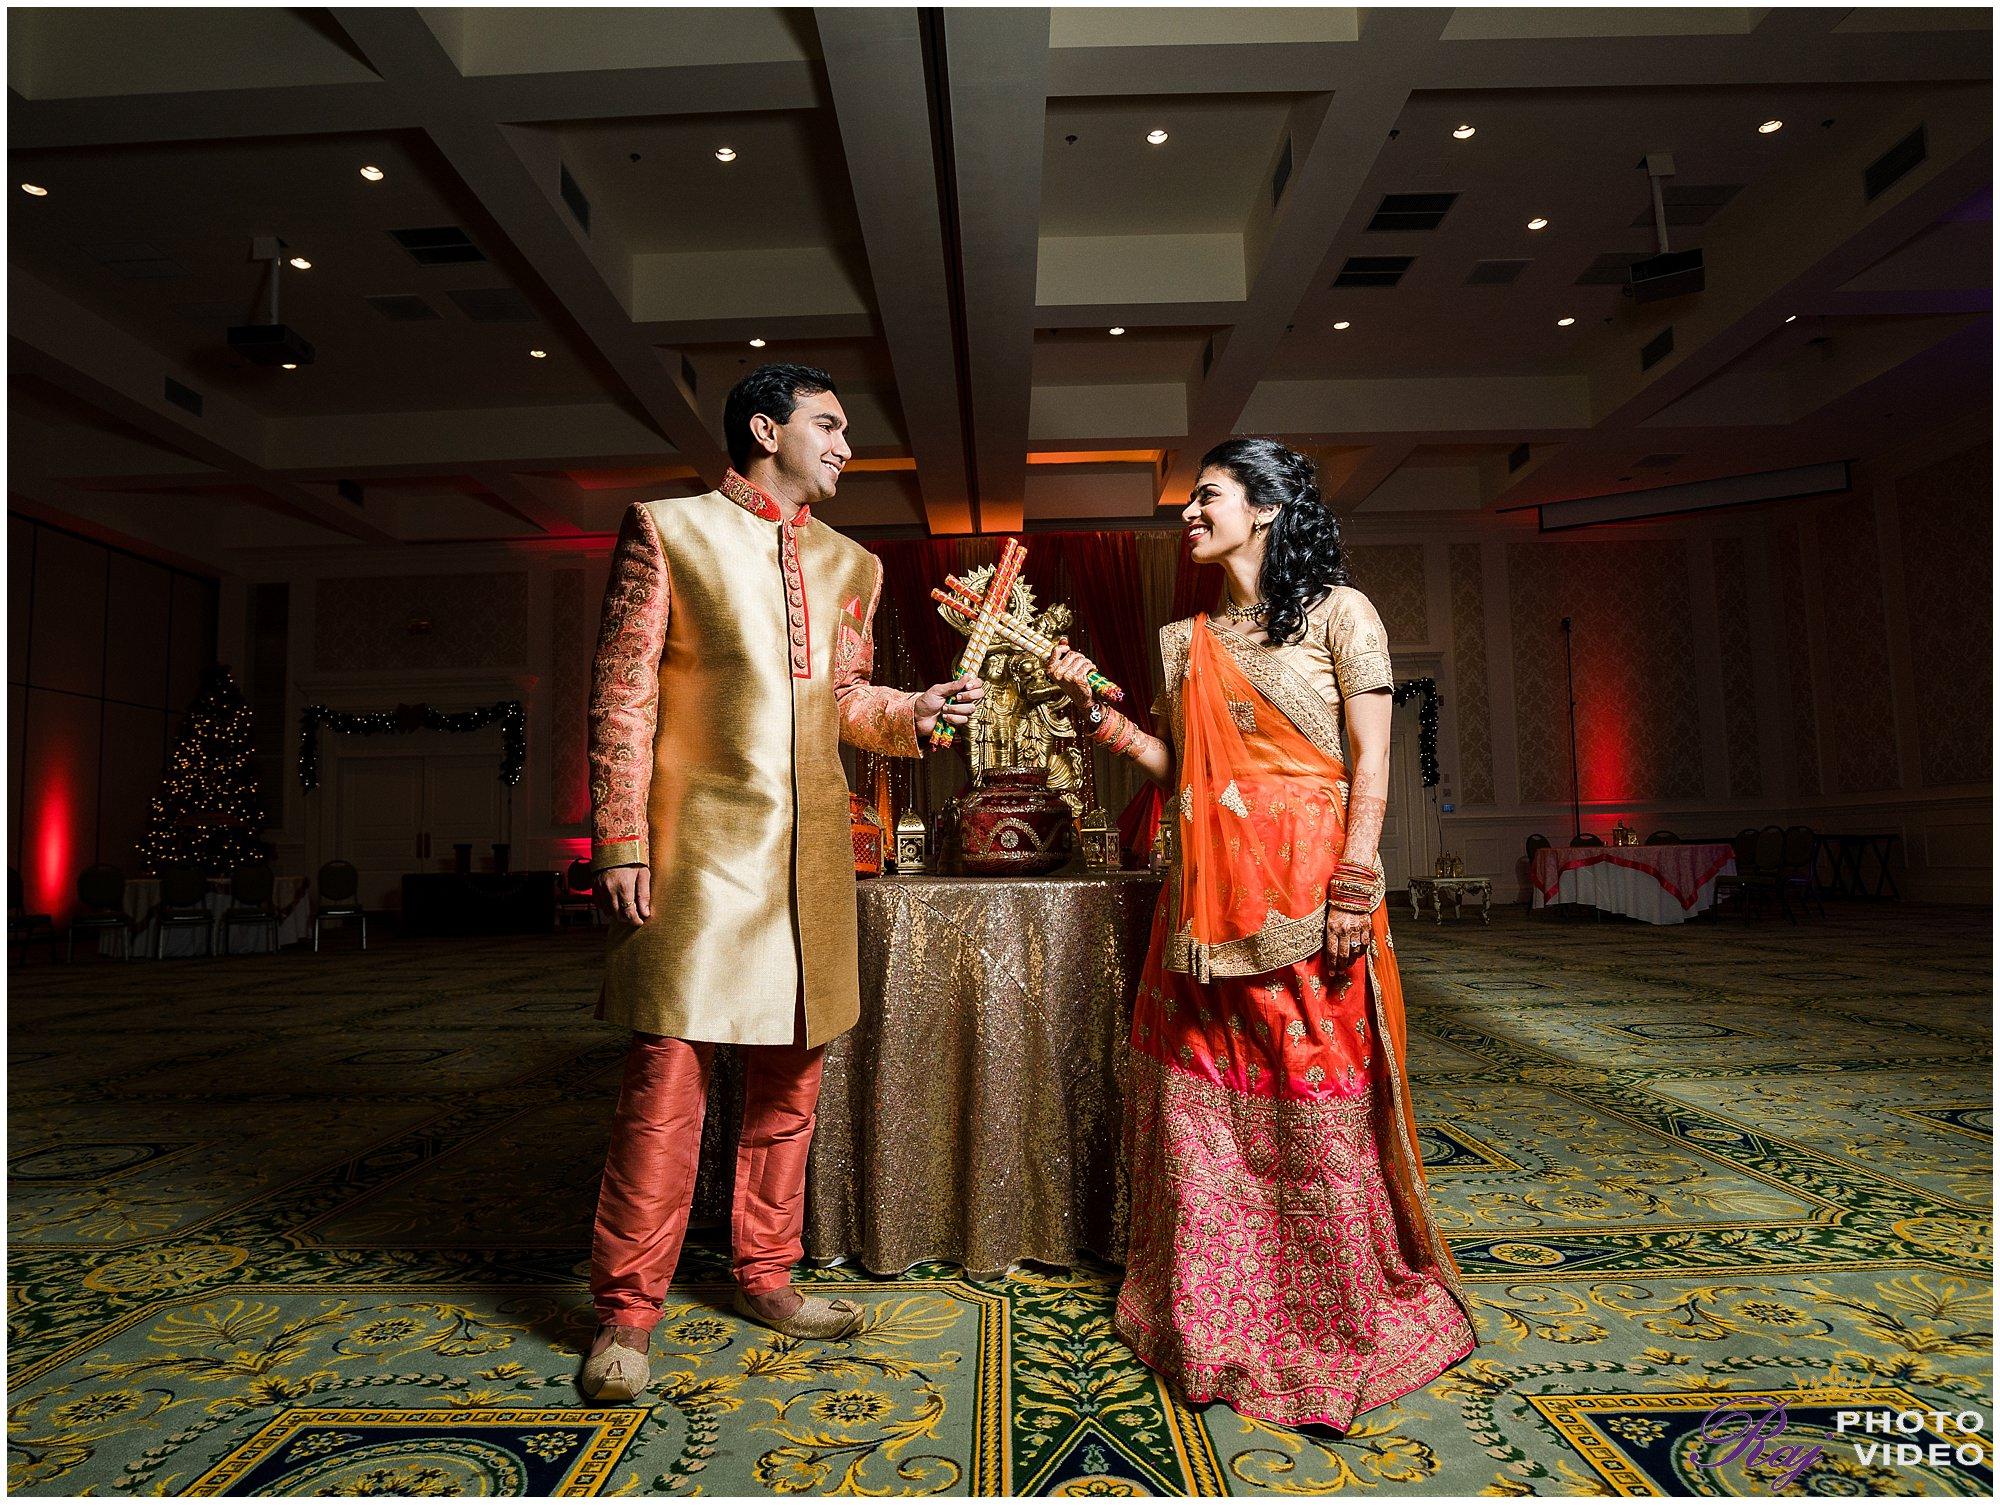 Founders-Inn-and-Spa-Virginia-Beach-VA-Indian-Wedding-Harini-Vivek-10.jpg